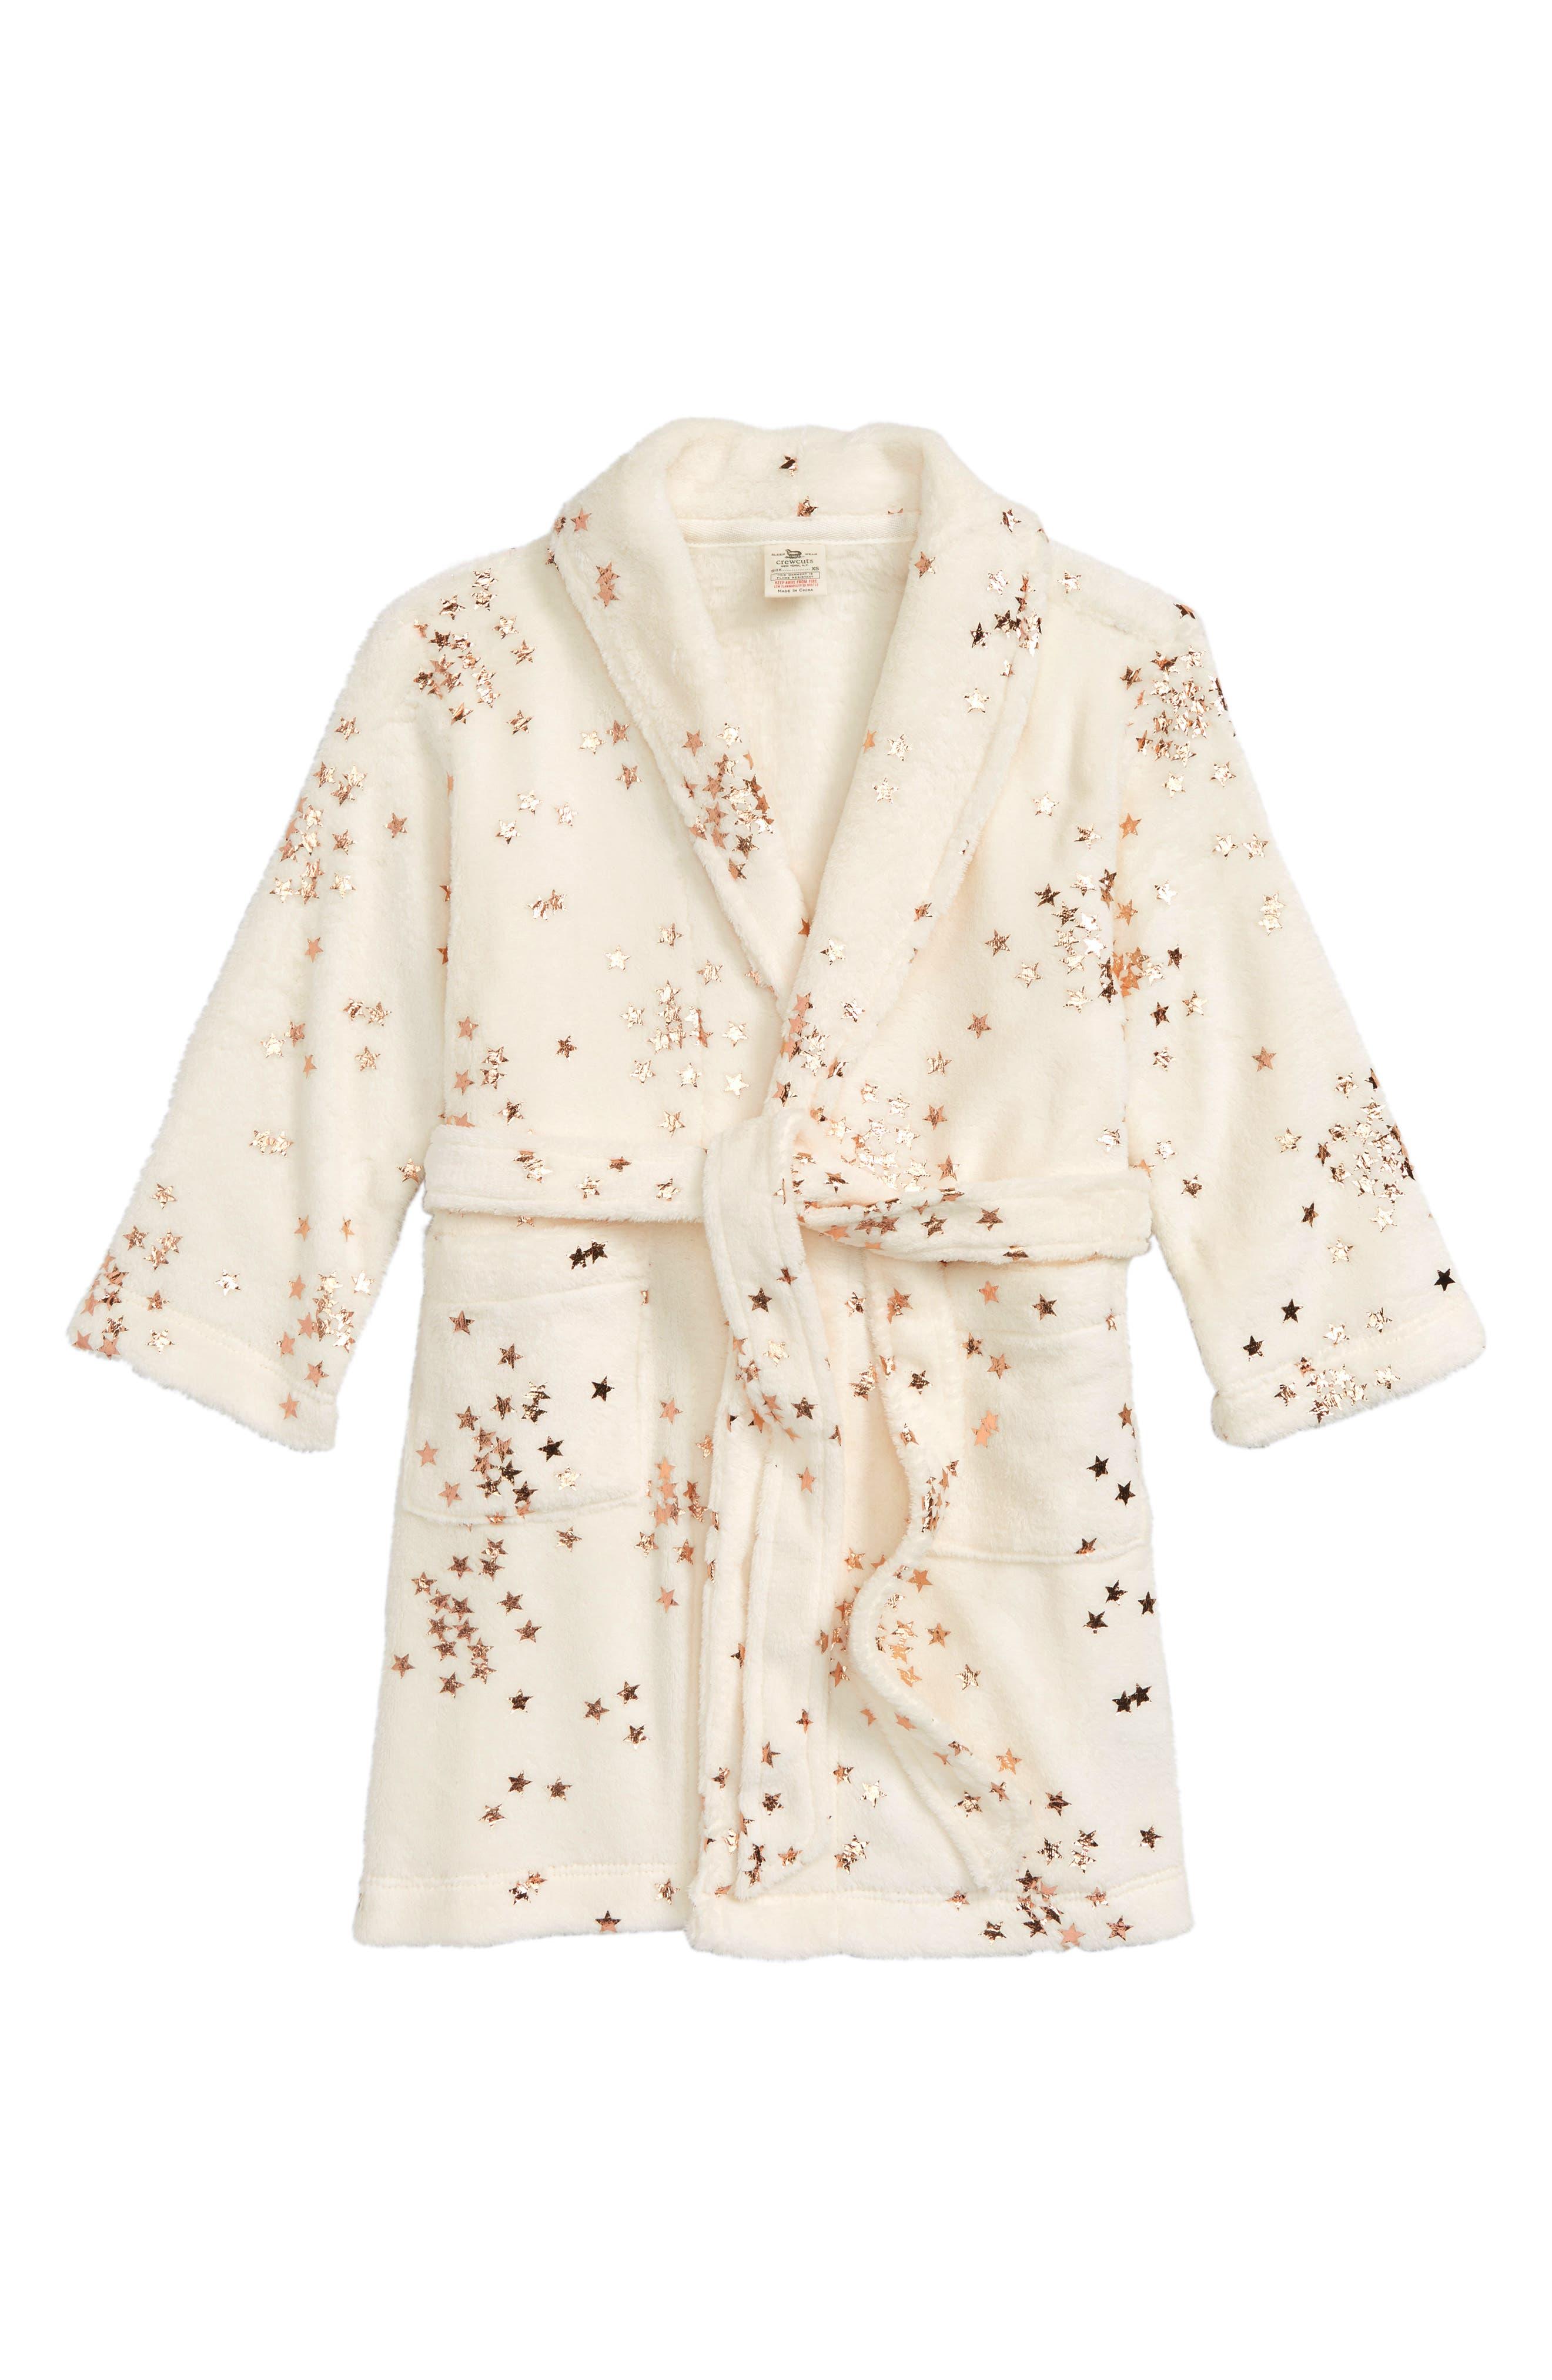 Girls Crewcuts By Jcrew Star Fleece Robe Size L (14)  Ivory